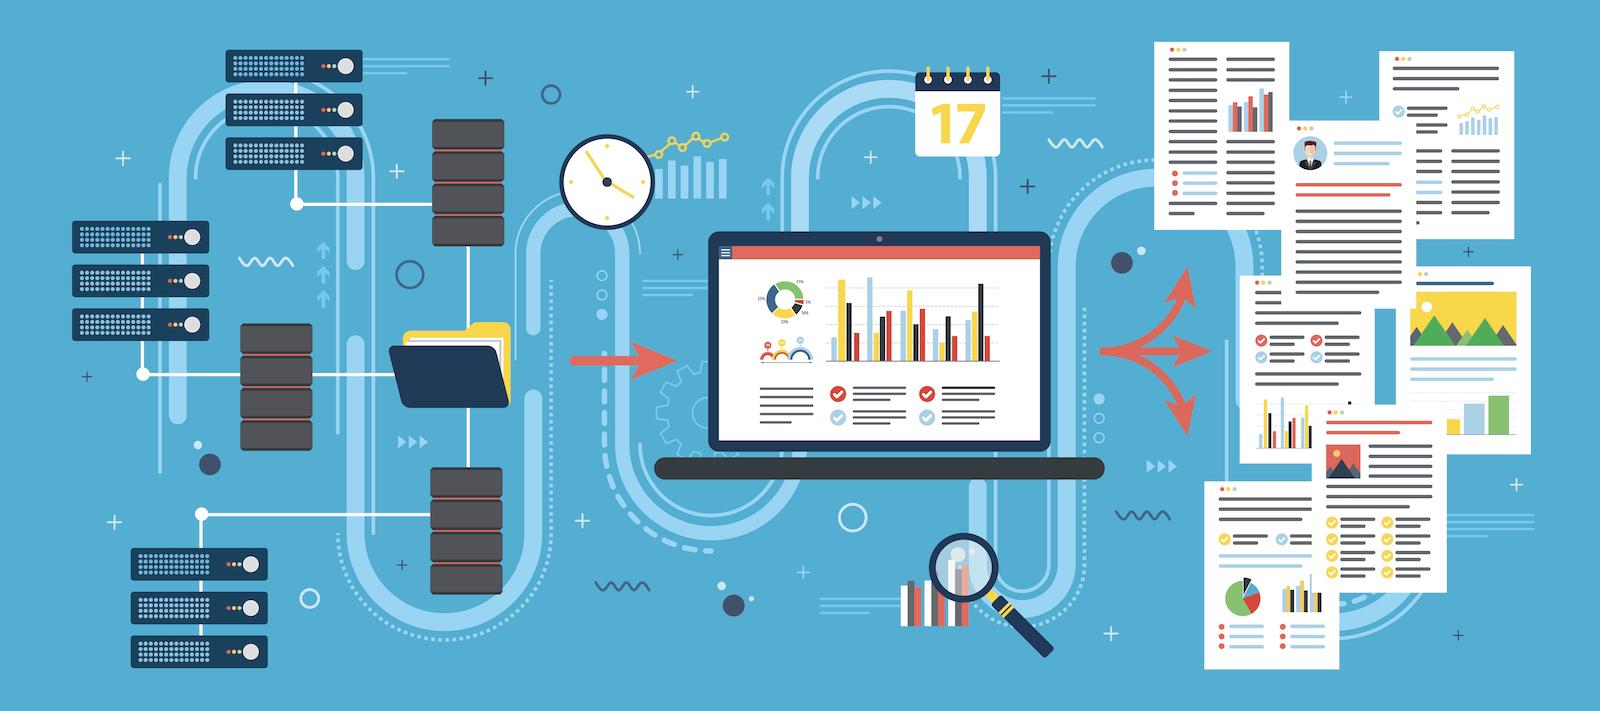 illustration of an enterprise data warehouse